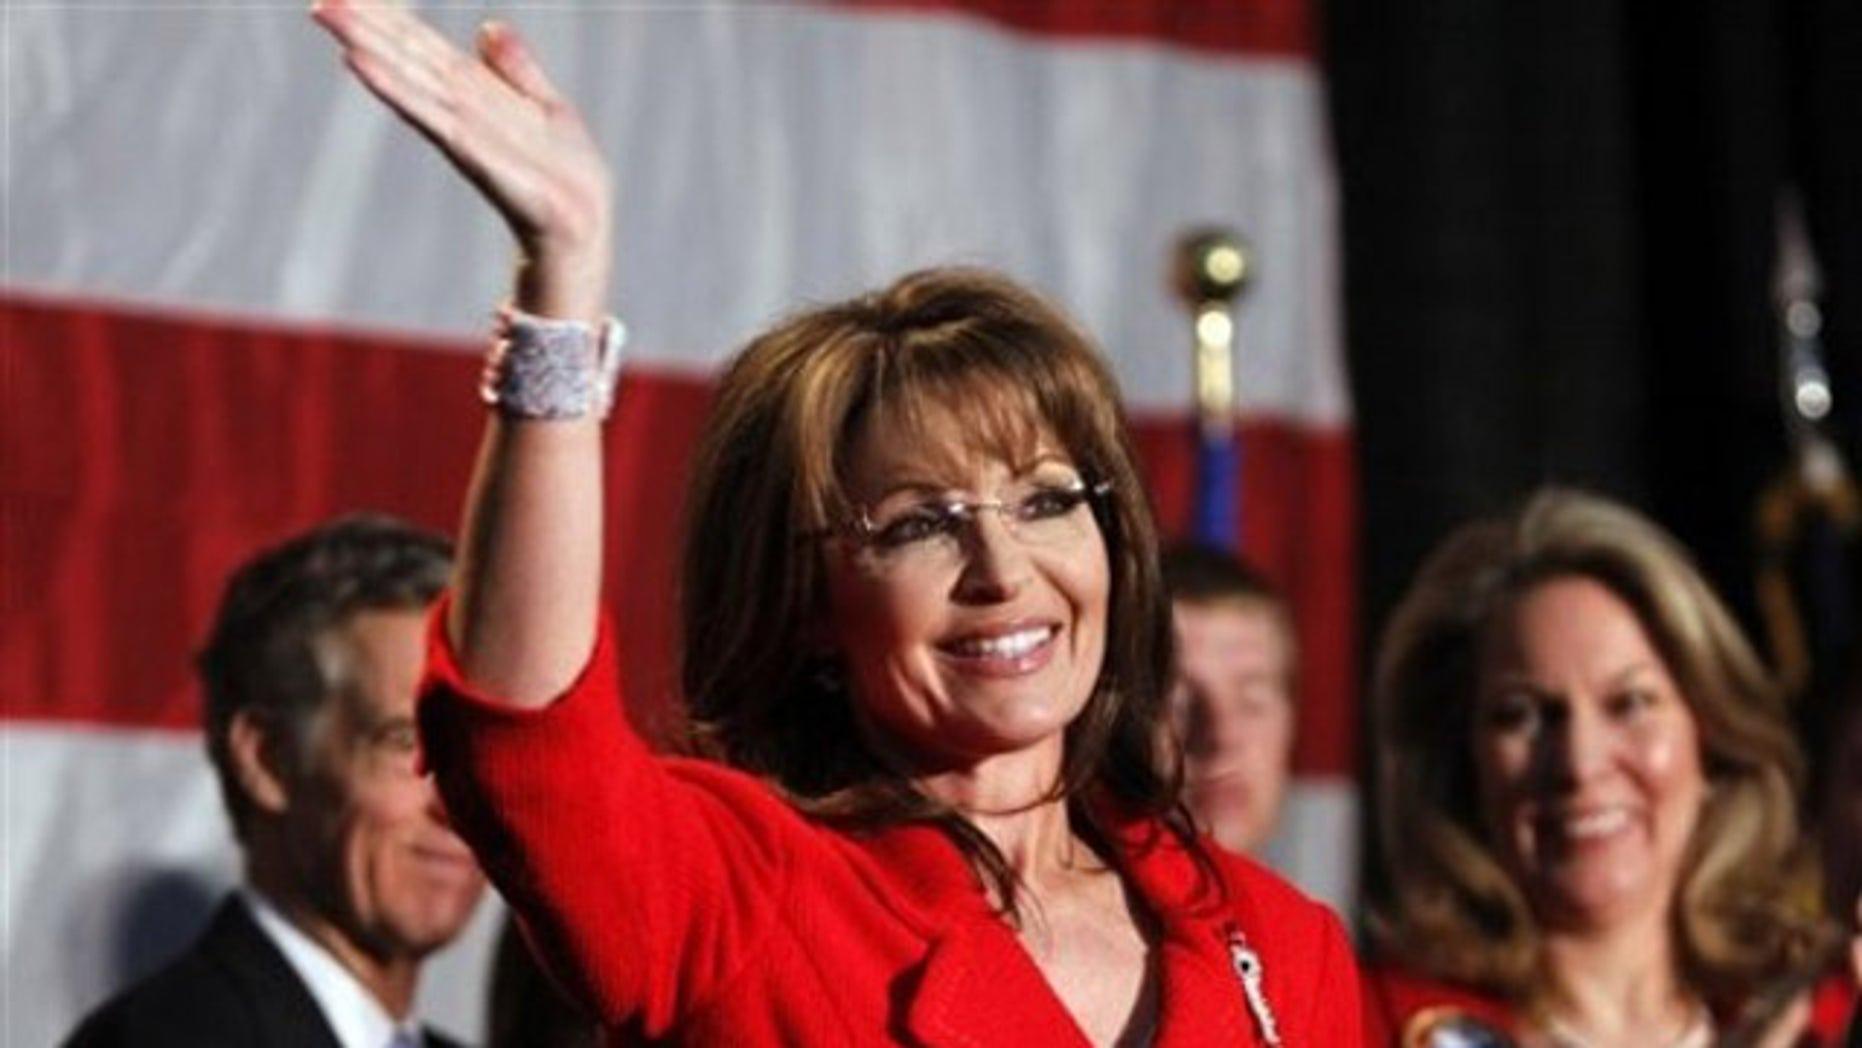 May 2: Former Alaska Governor Sarah Palin waves during a fund raiser at Colorado Christian University in Lakewood, Colo. (AP).